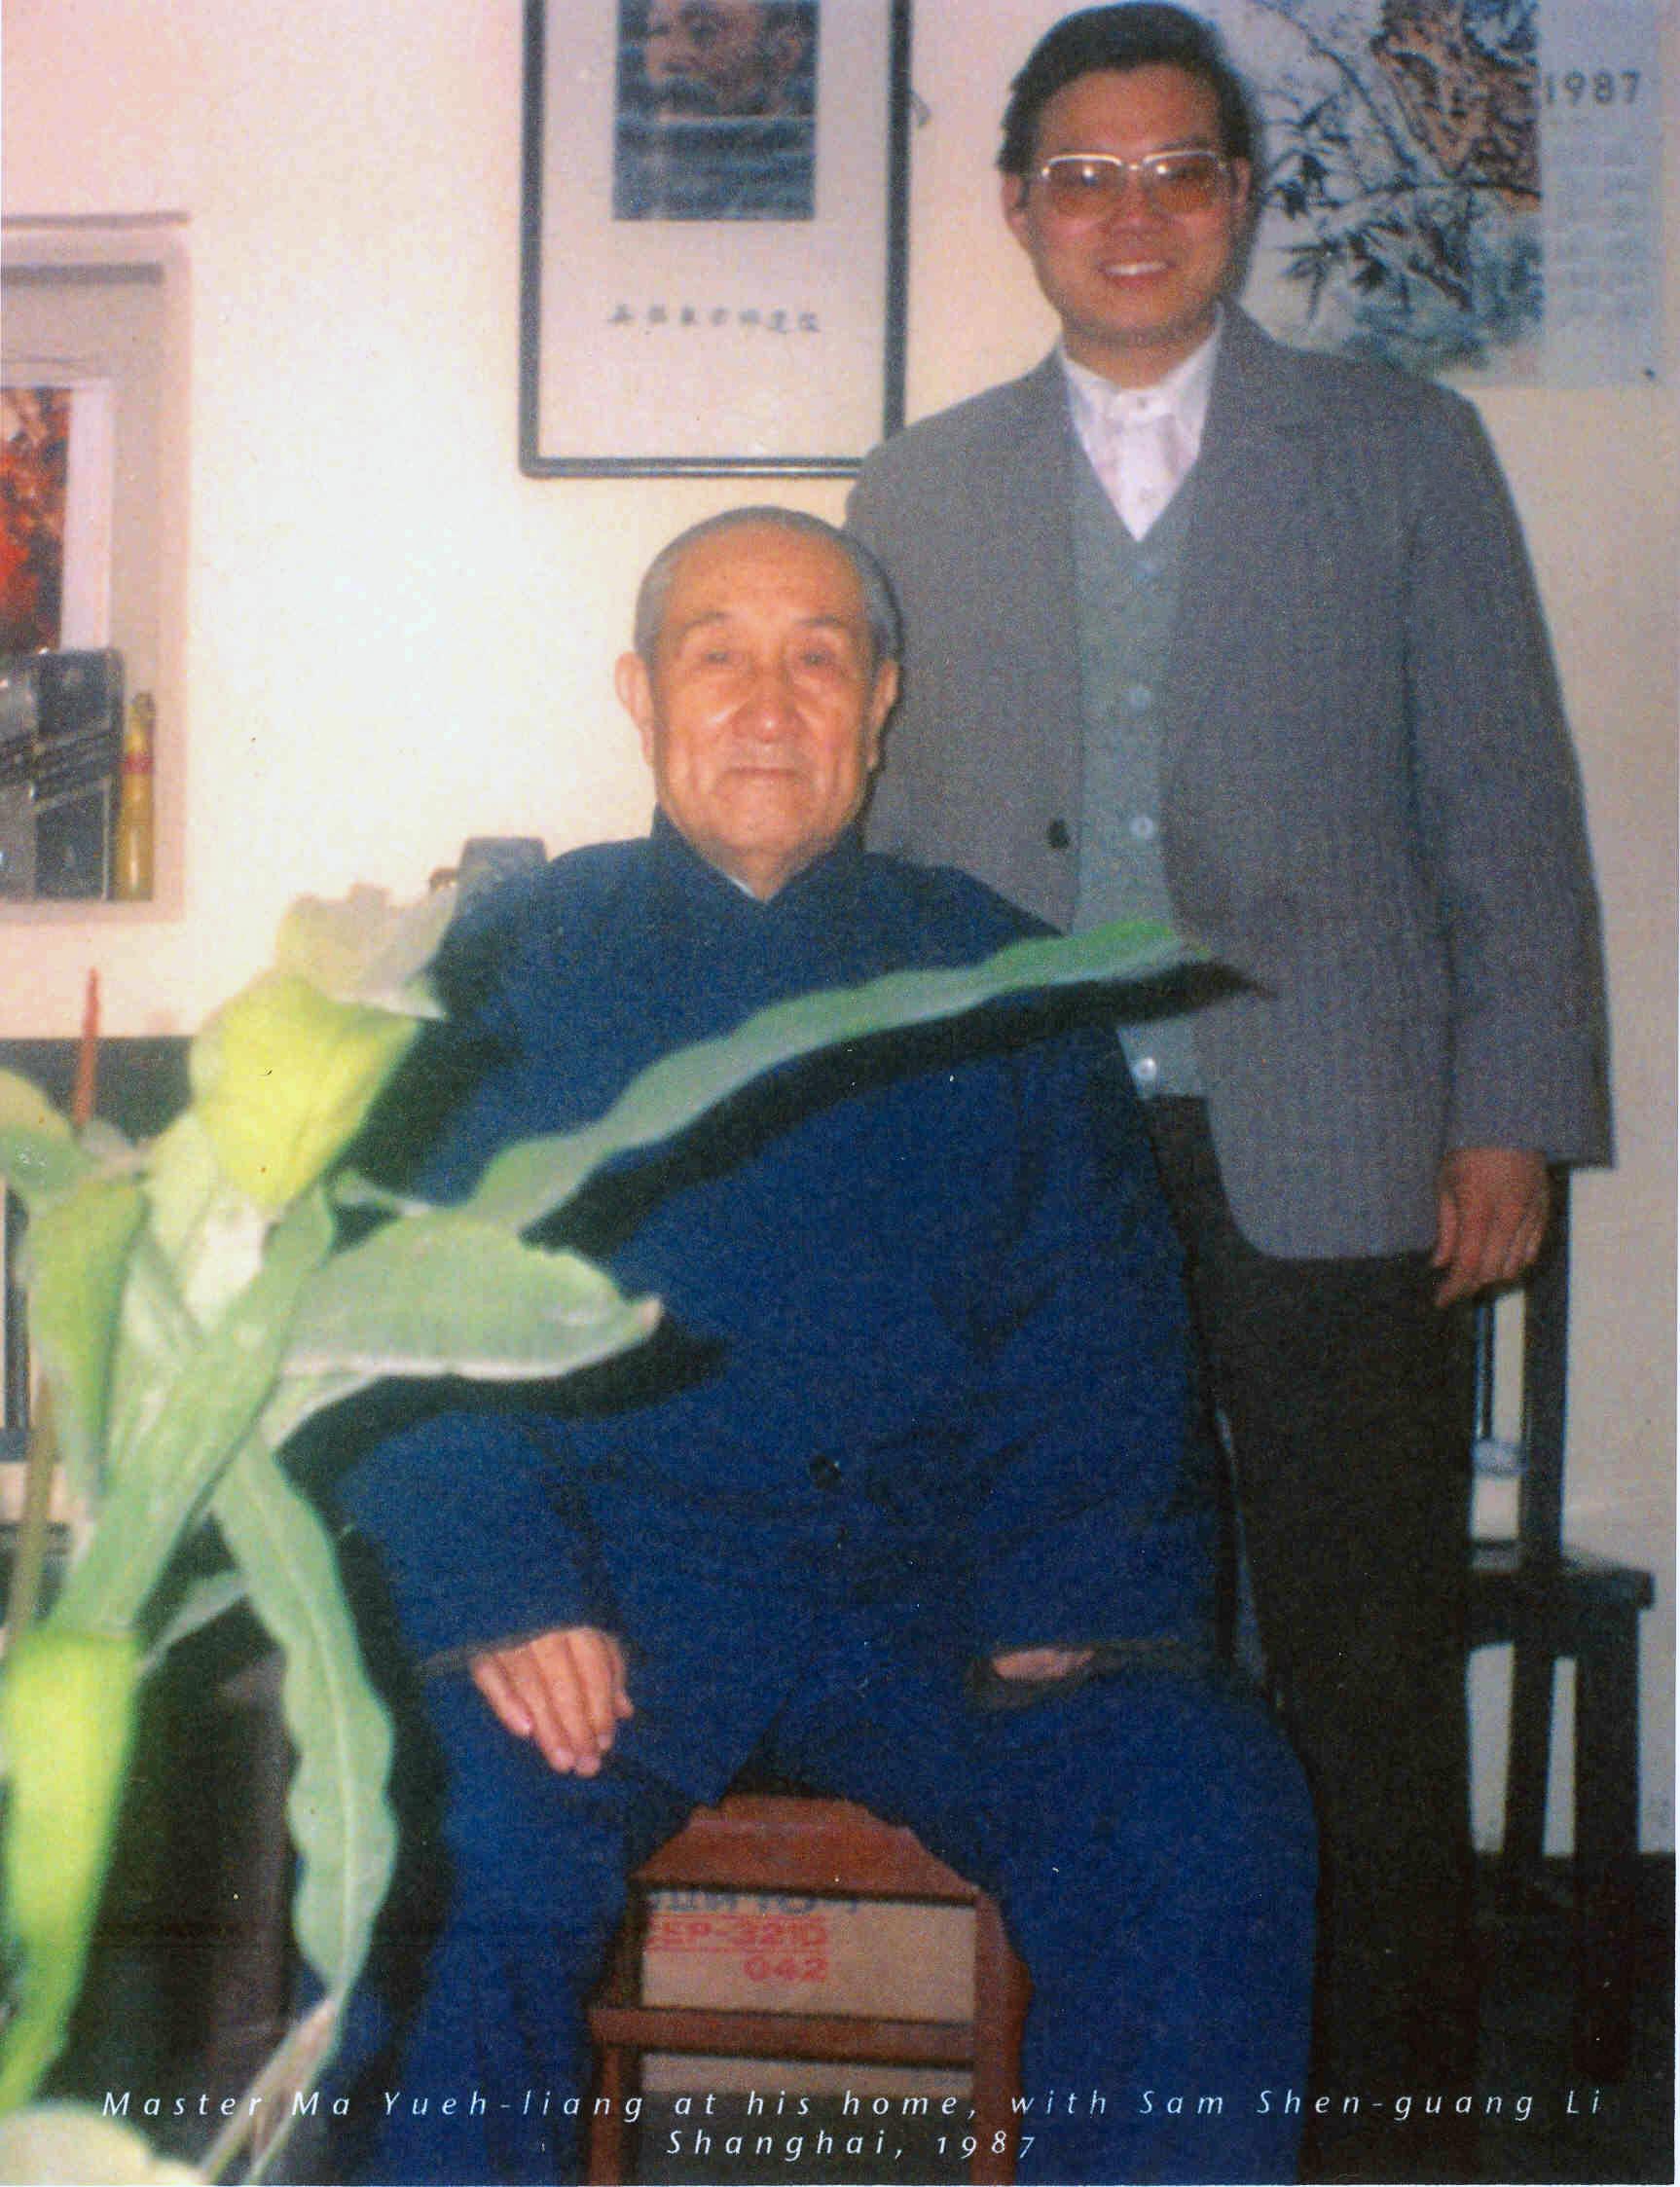 Master Ma and Sam Li